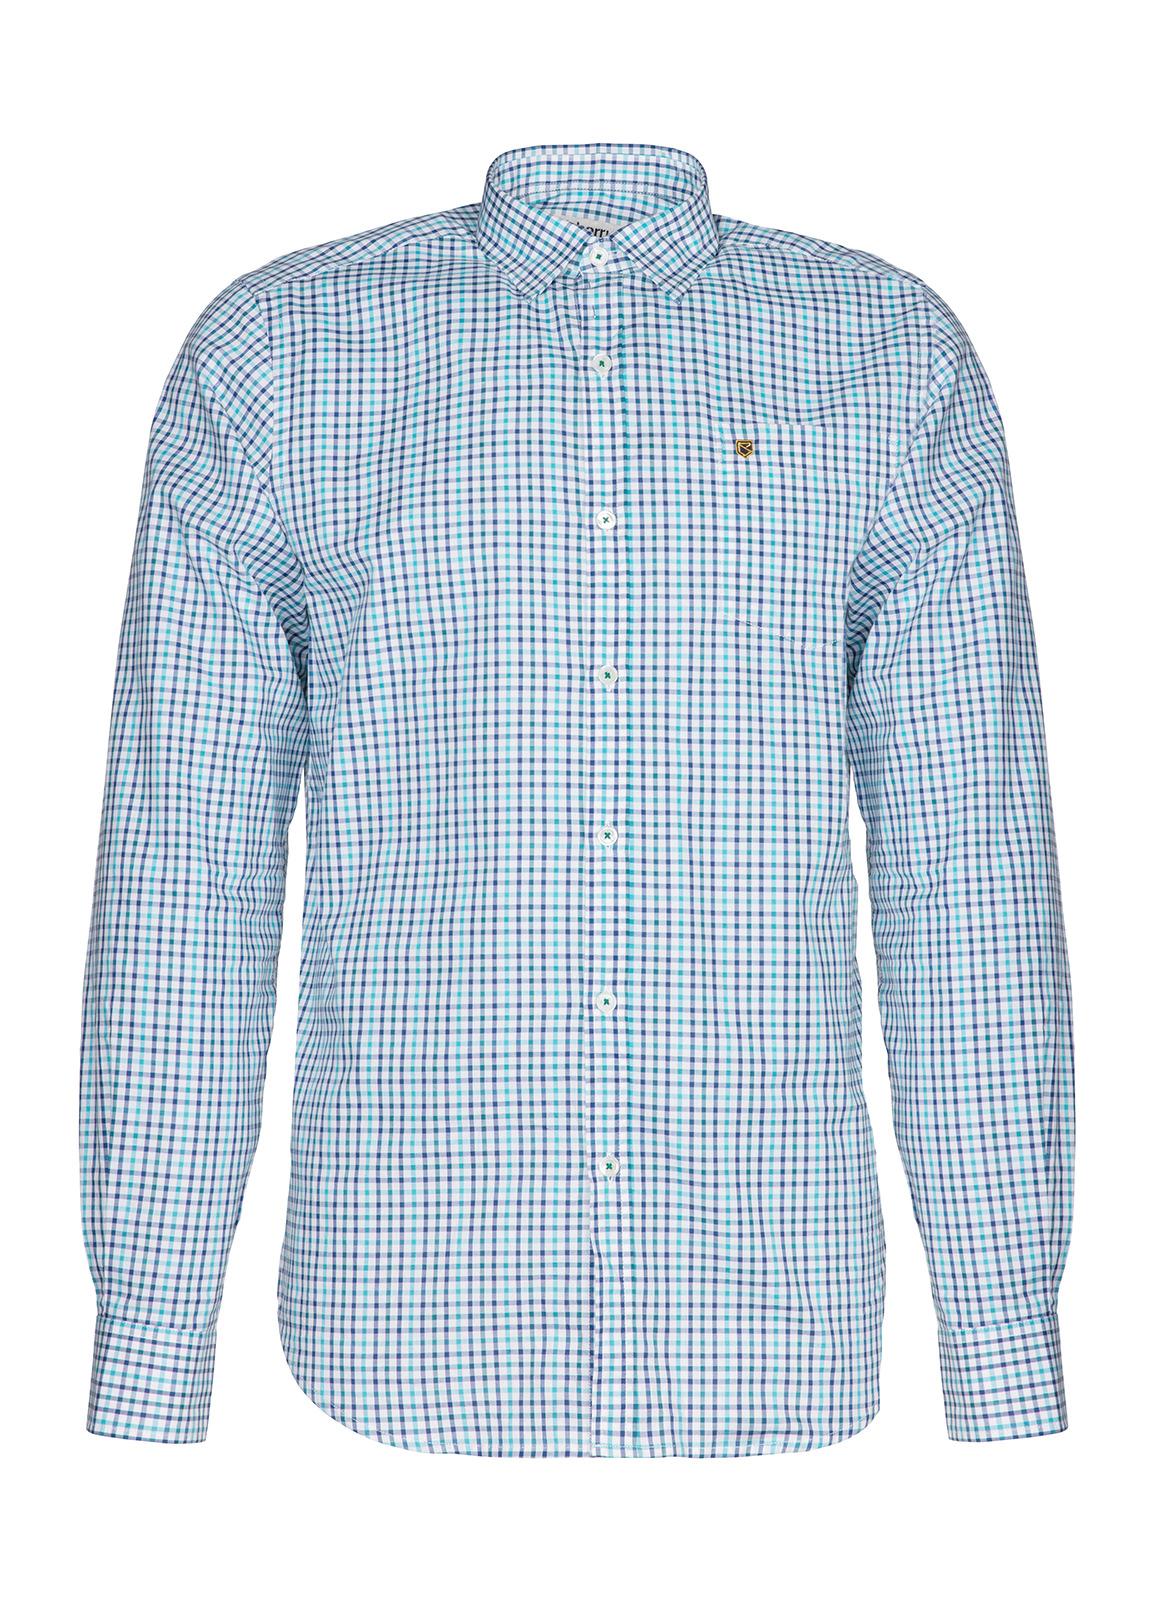 Dubarry_ Ballincollig shirt - Various_Image_2